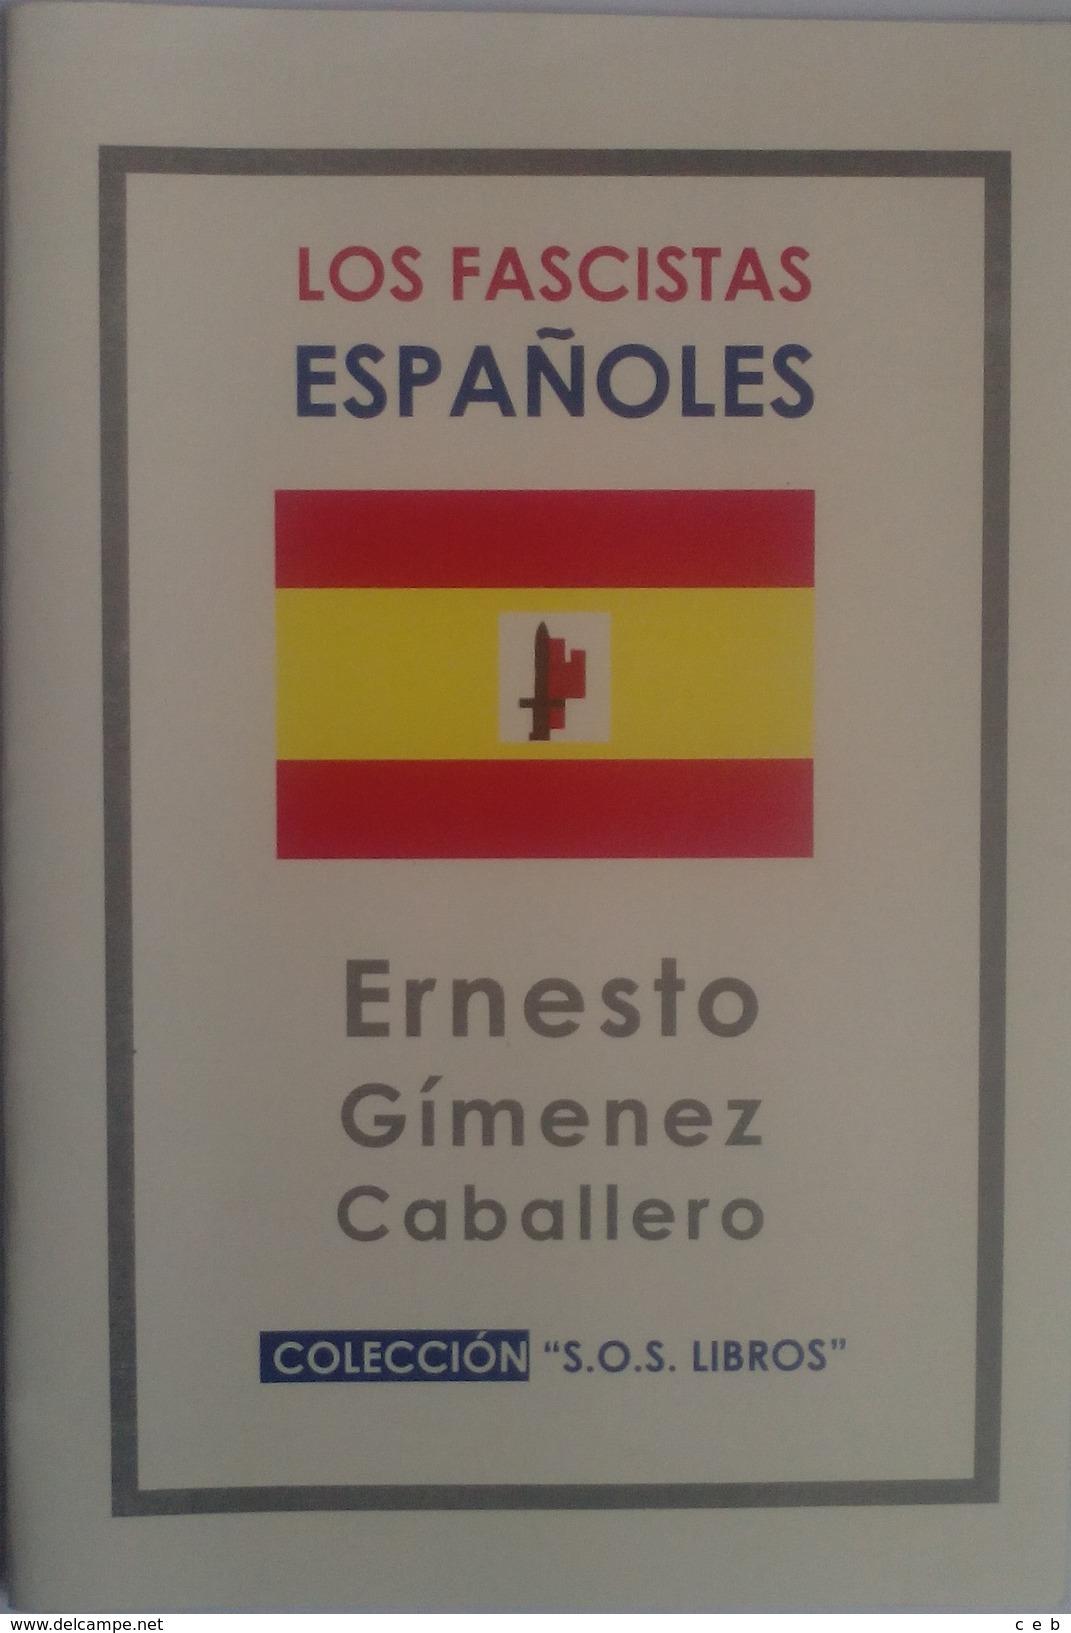 Libro: Los Fascistas Españoles. (1931). Autor: Ernesto Giménez Caballero. 1999. Méjico - Español